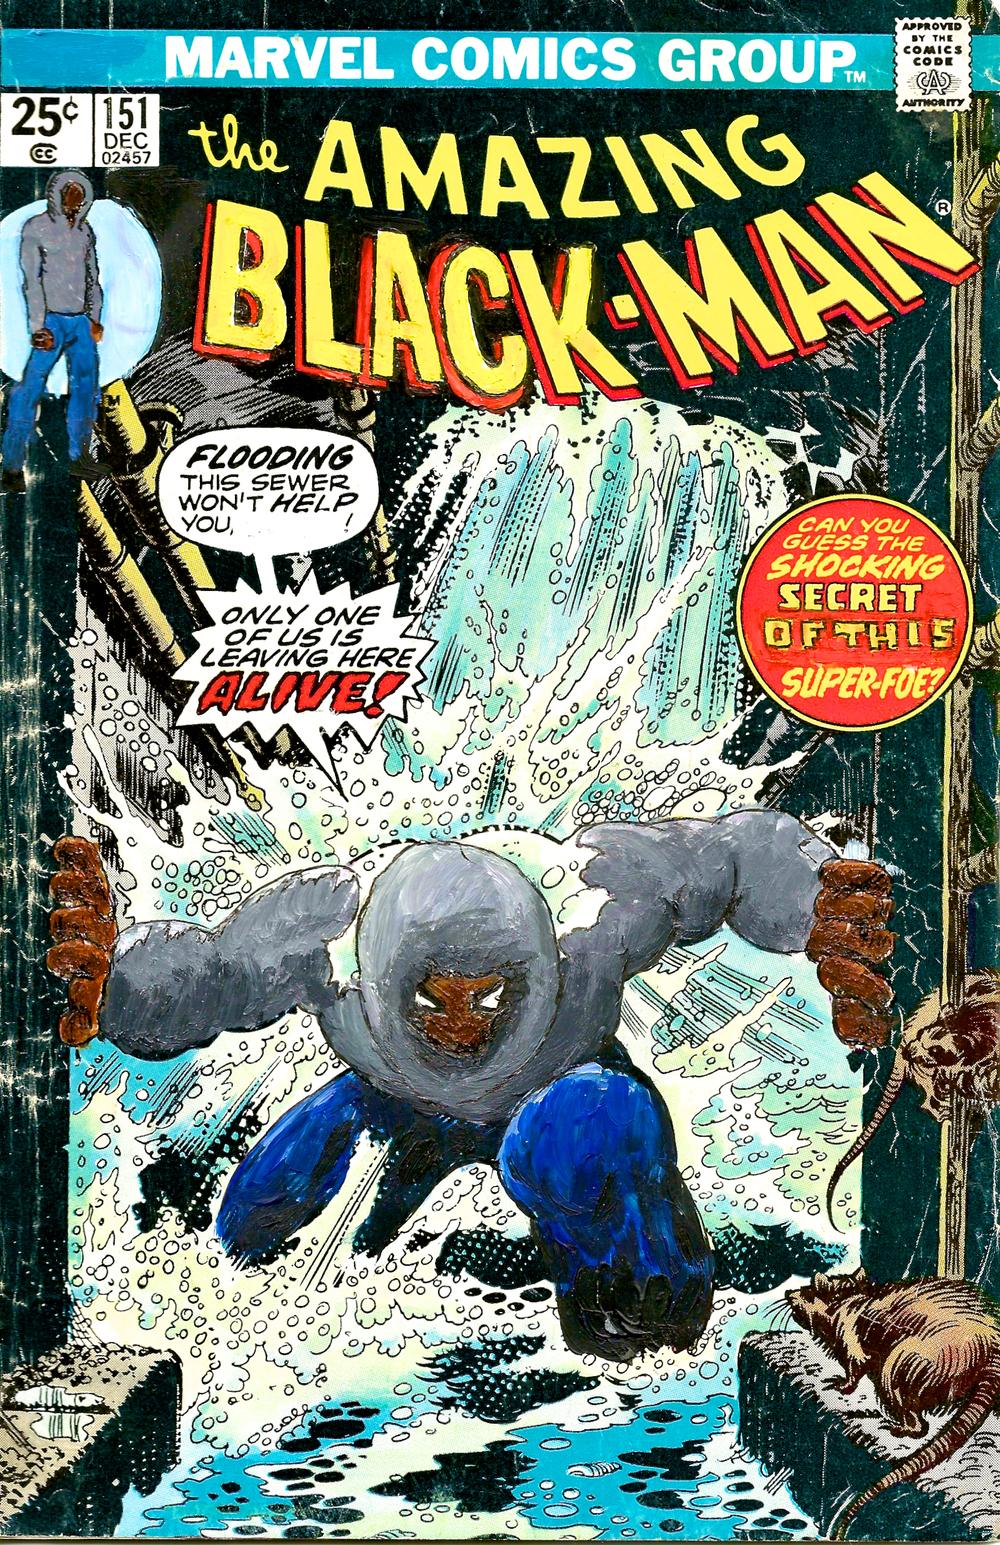 The Amazing Black-Man #151